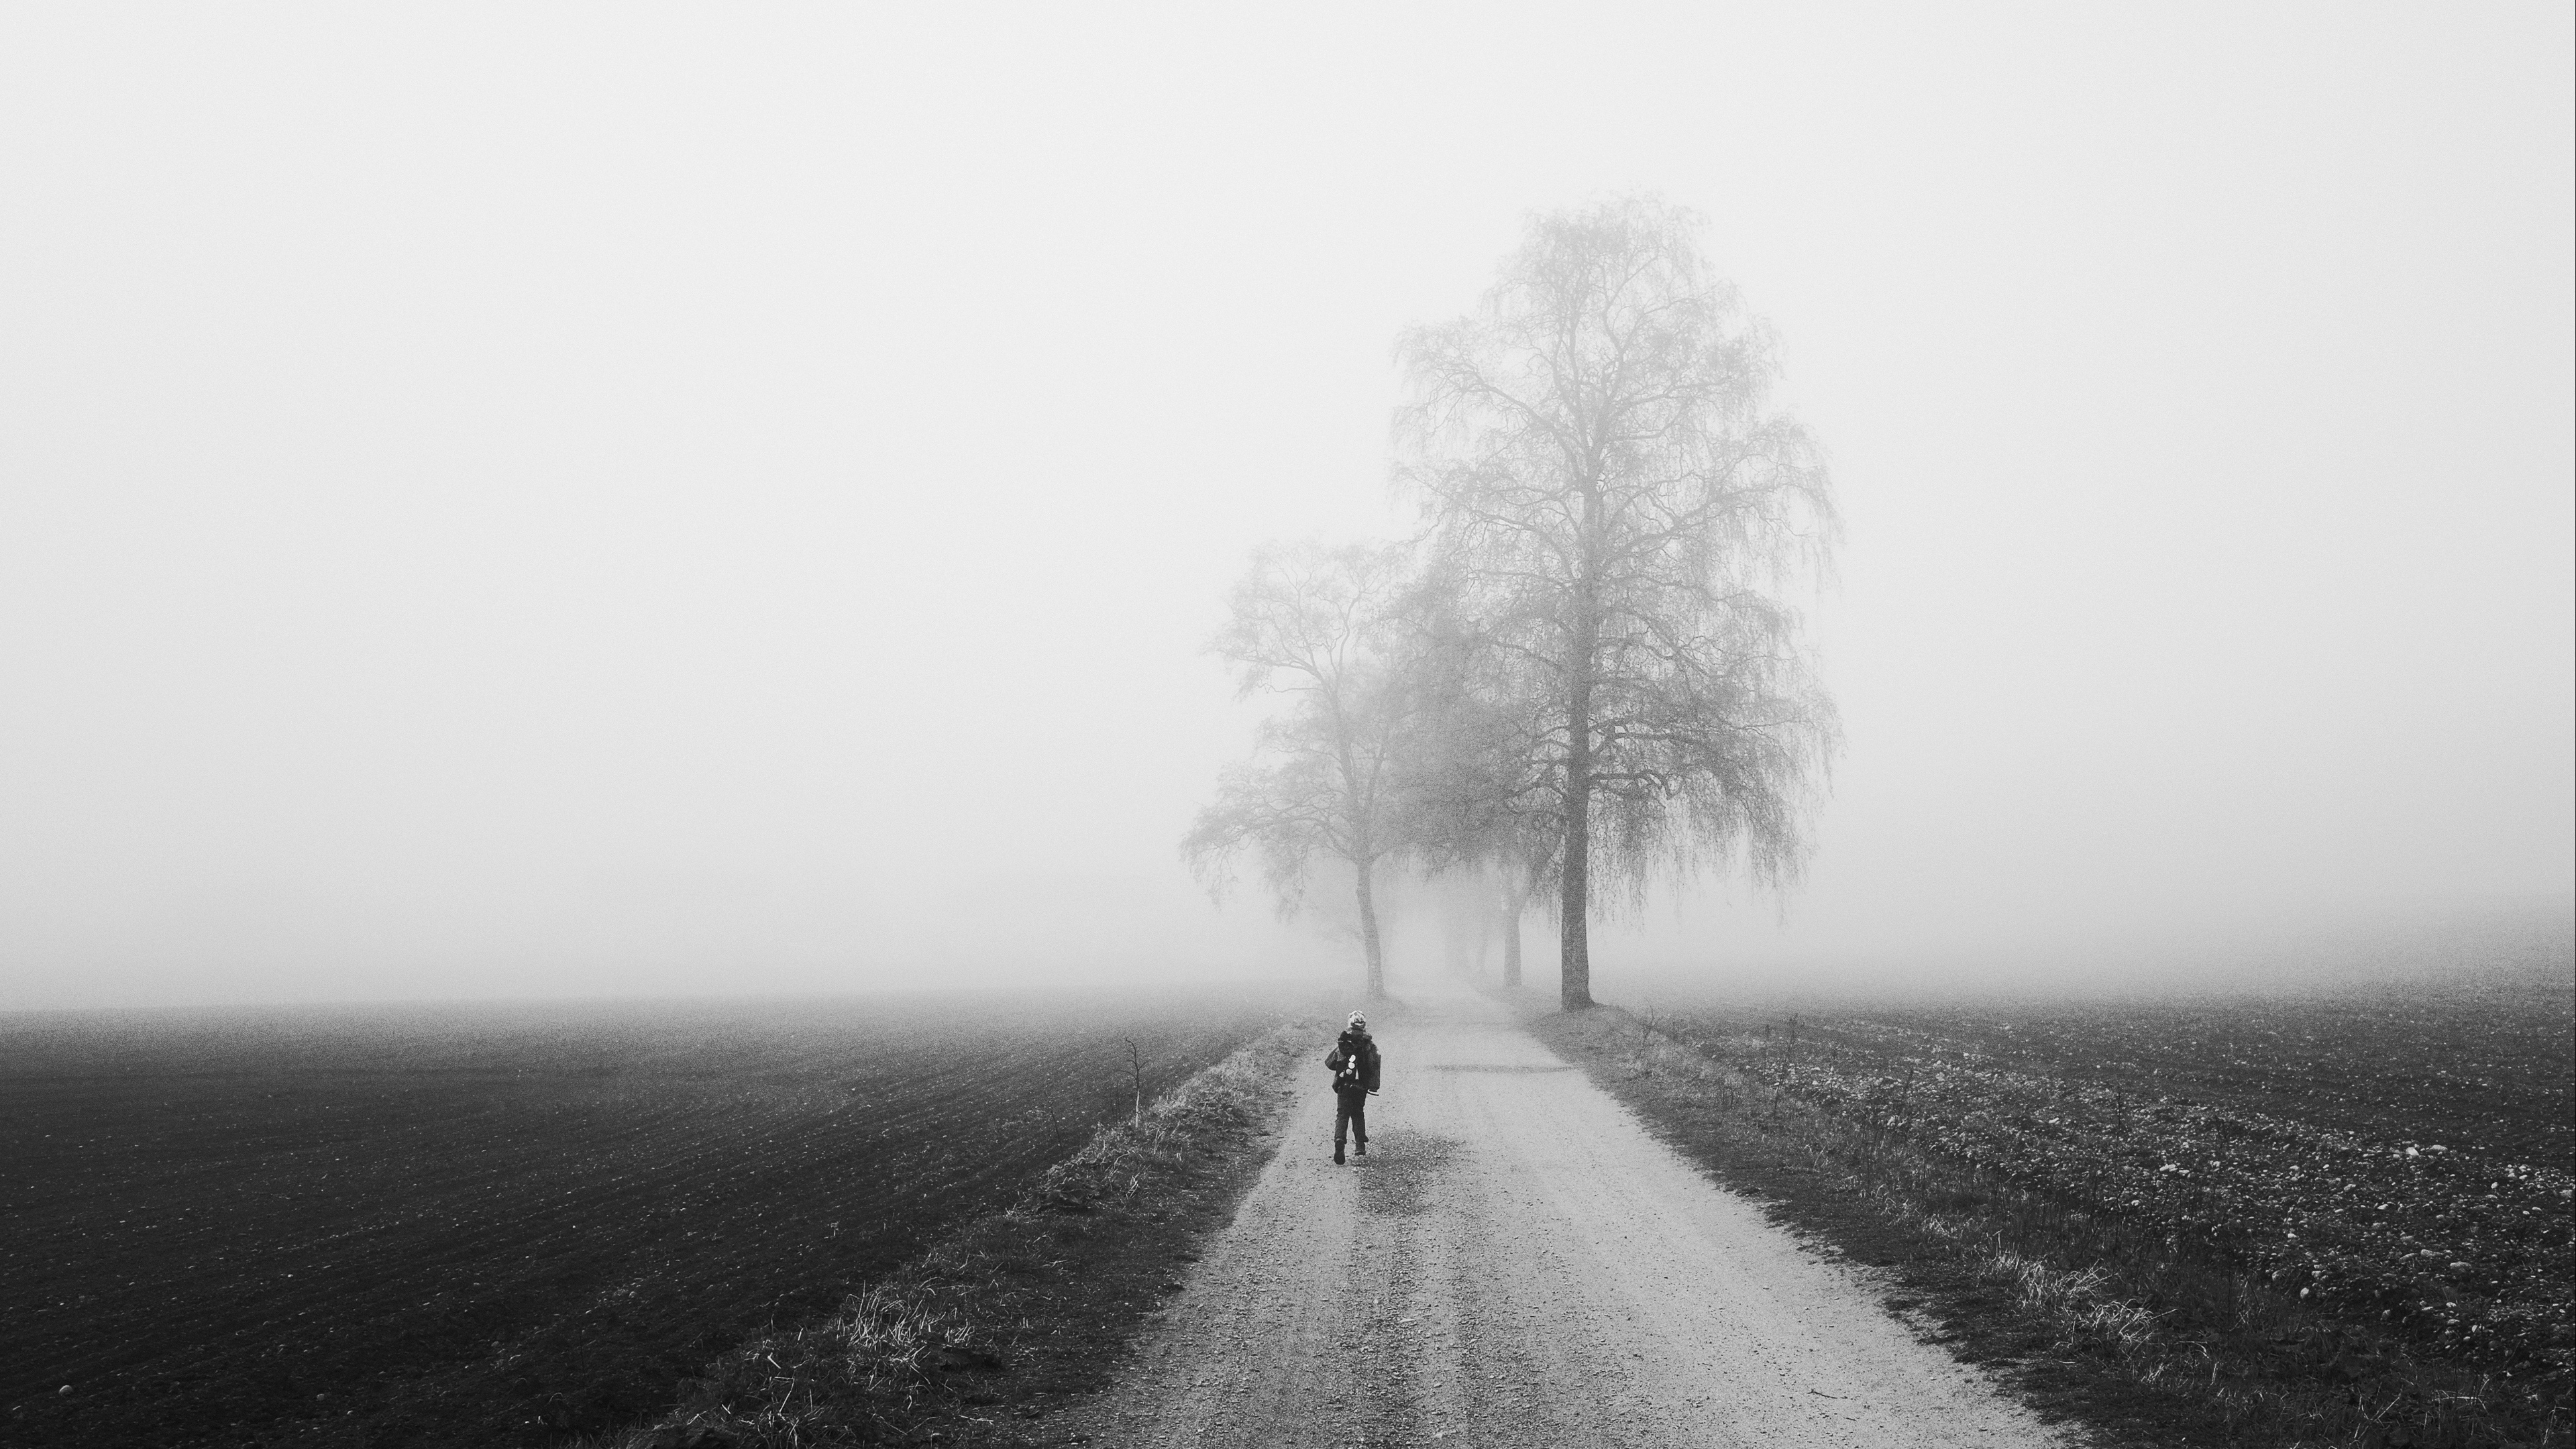 fog alone bw silhouette road trees 4k 1541117192 - fog, alone, bw, silhouette, road, trees 4k - fog, bw, Alone